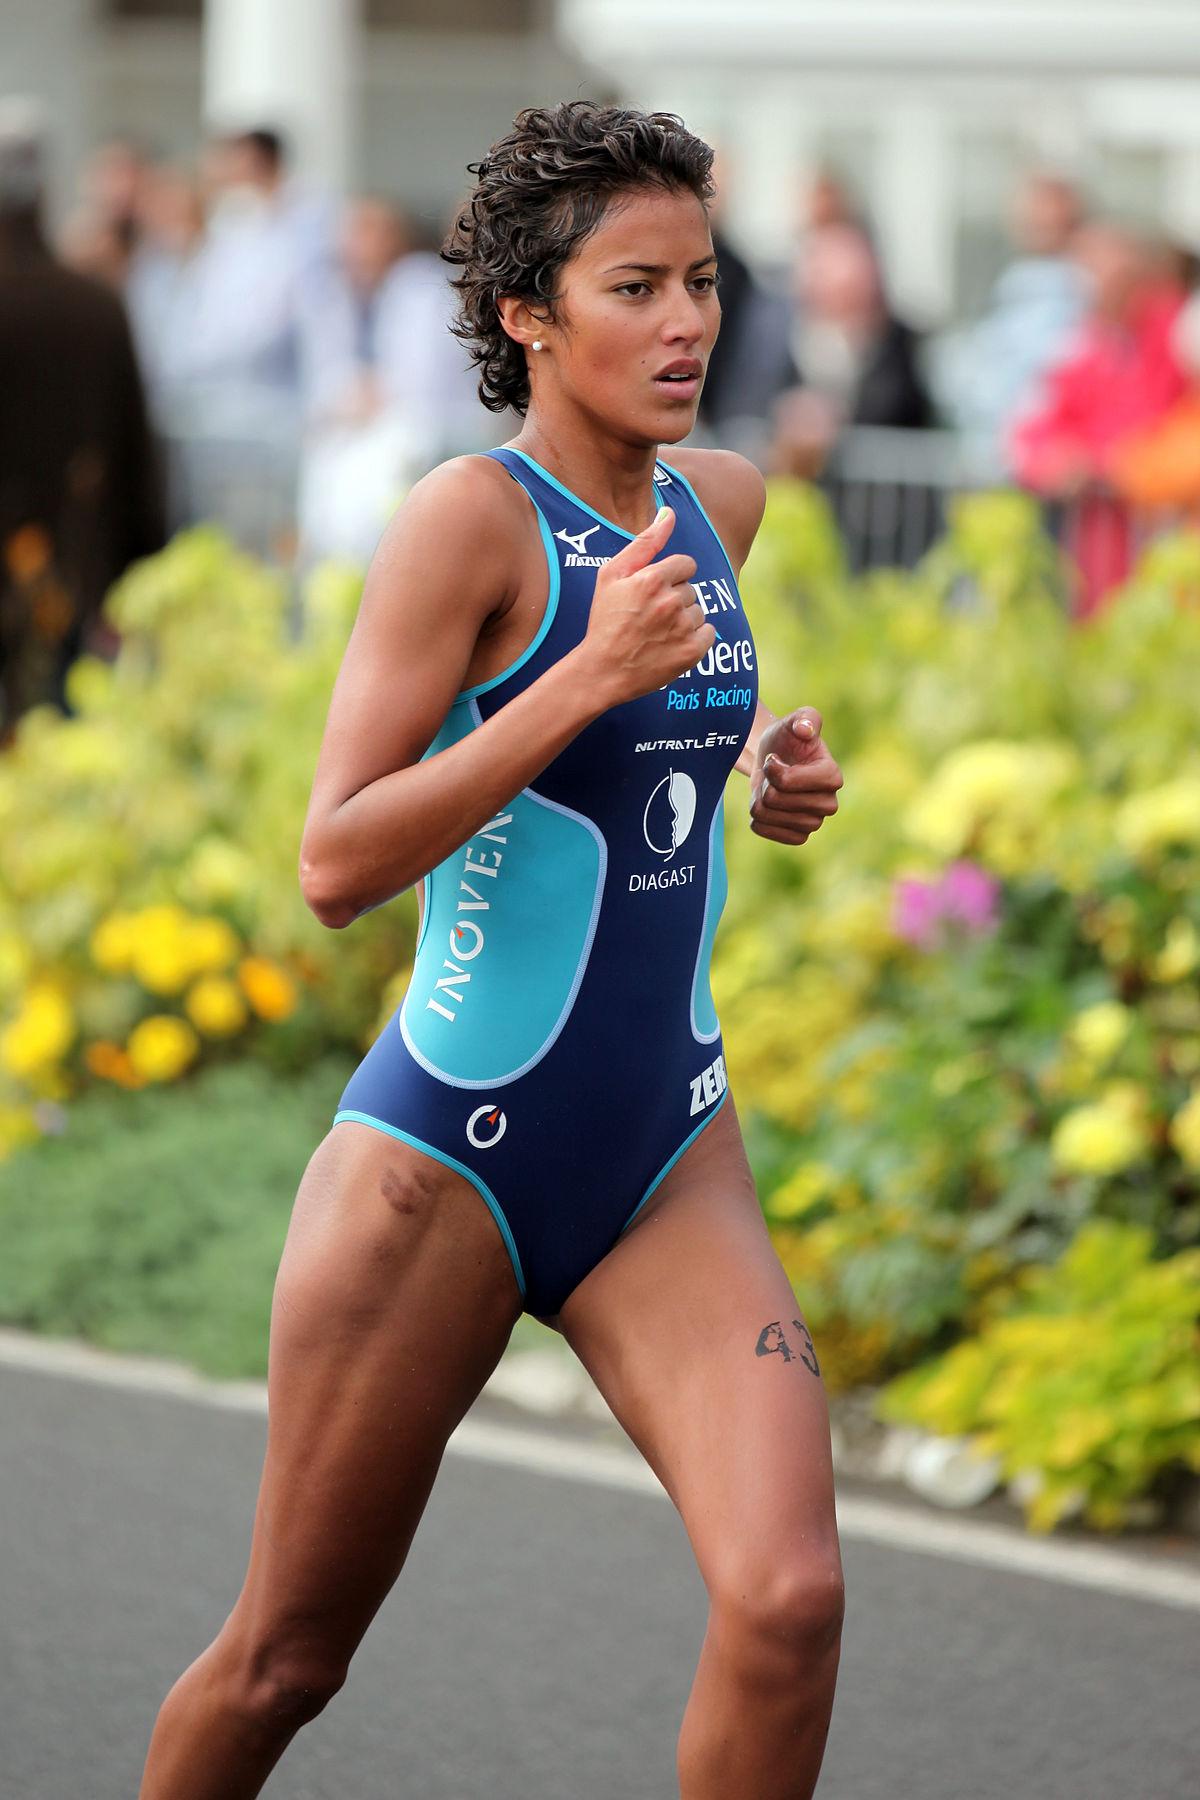 Hot girls doing triathlons matchless